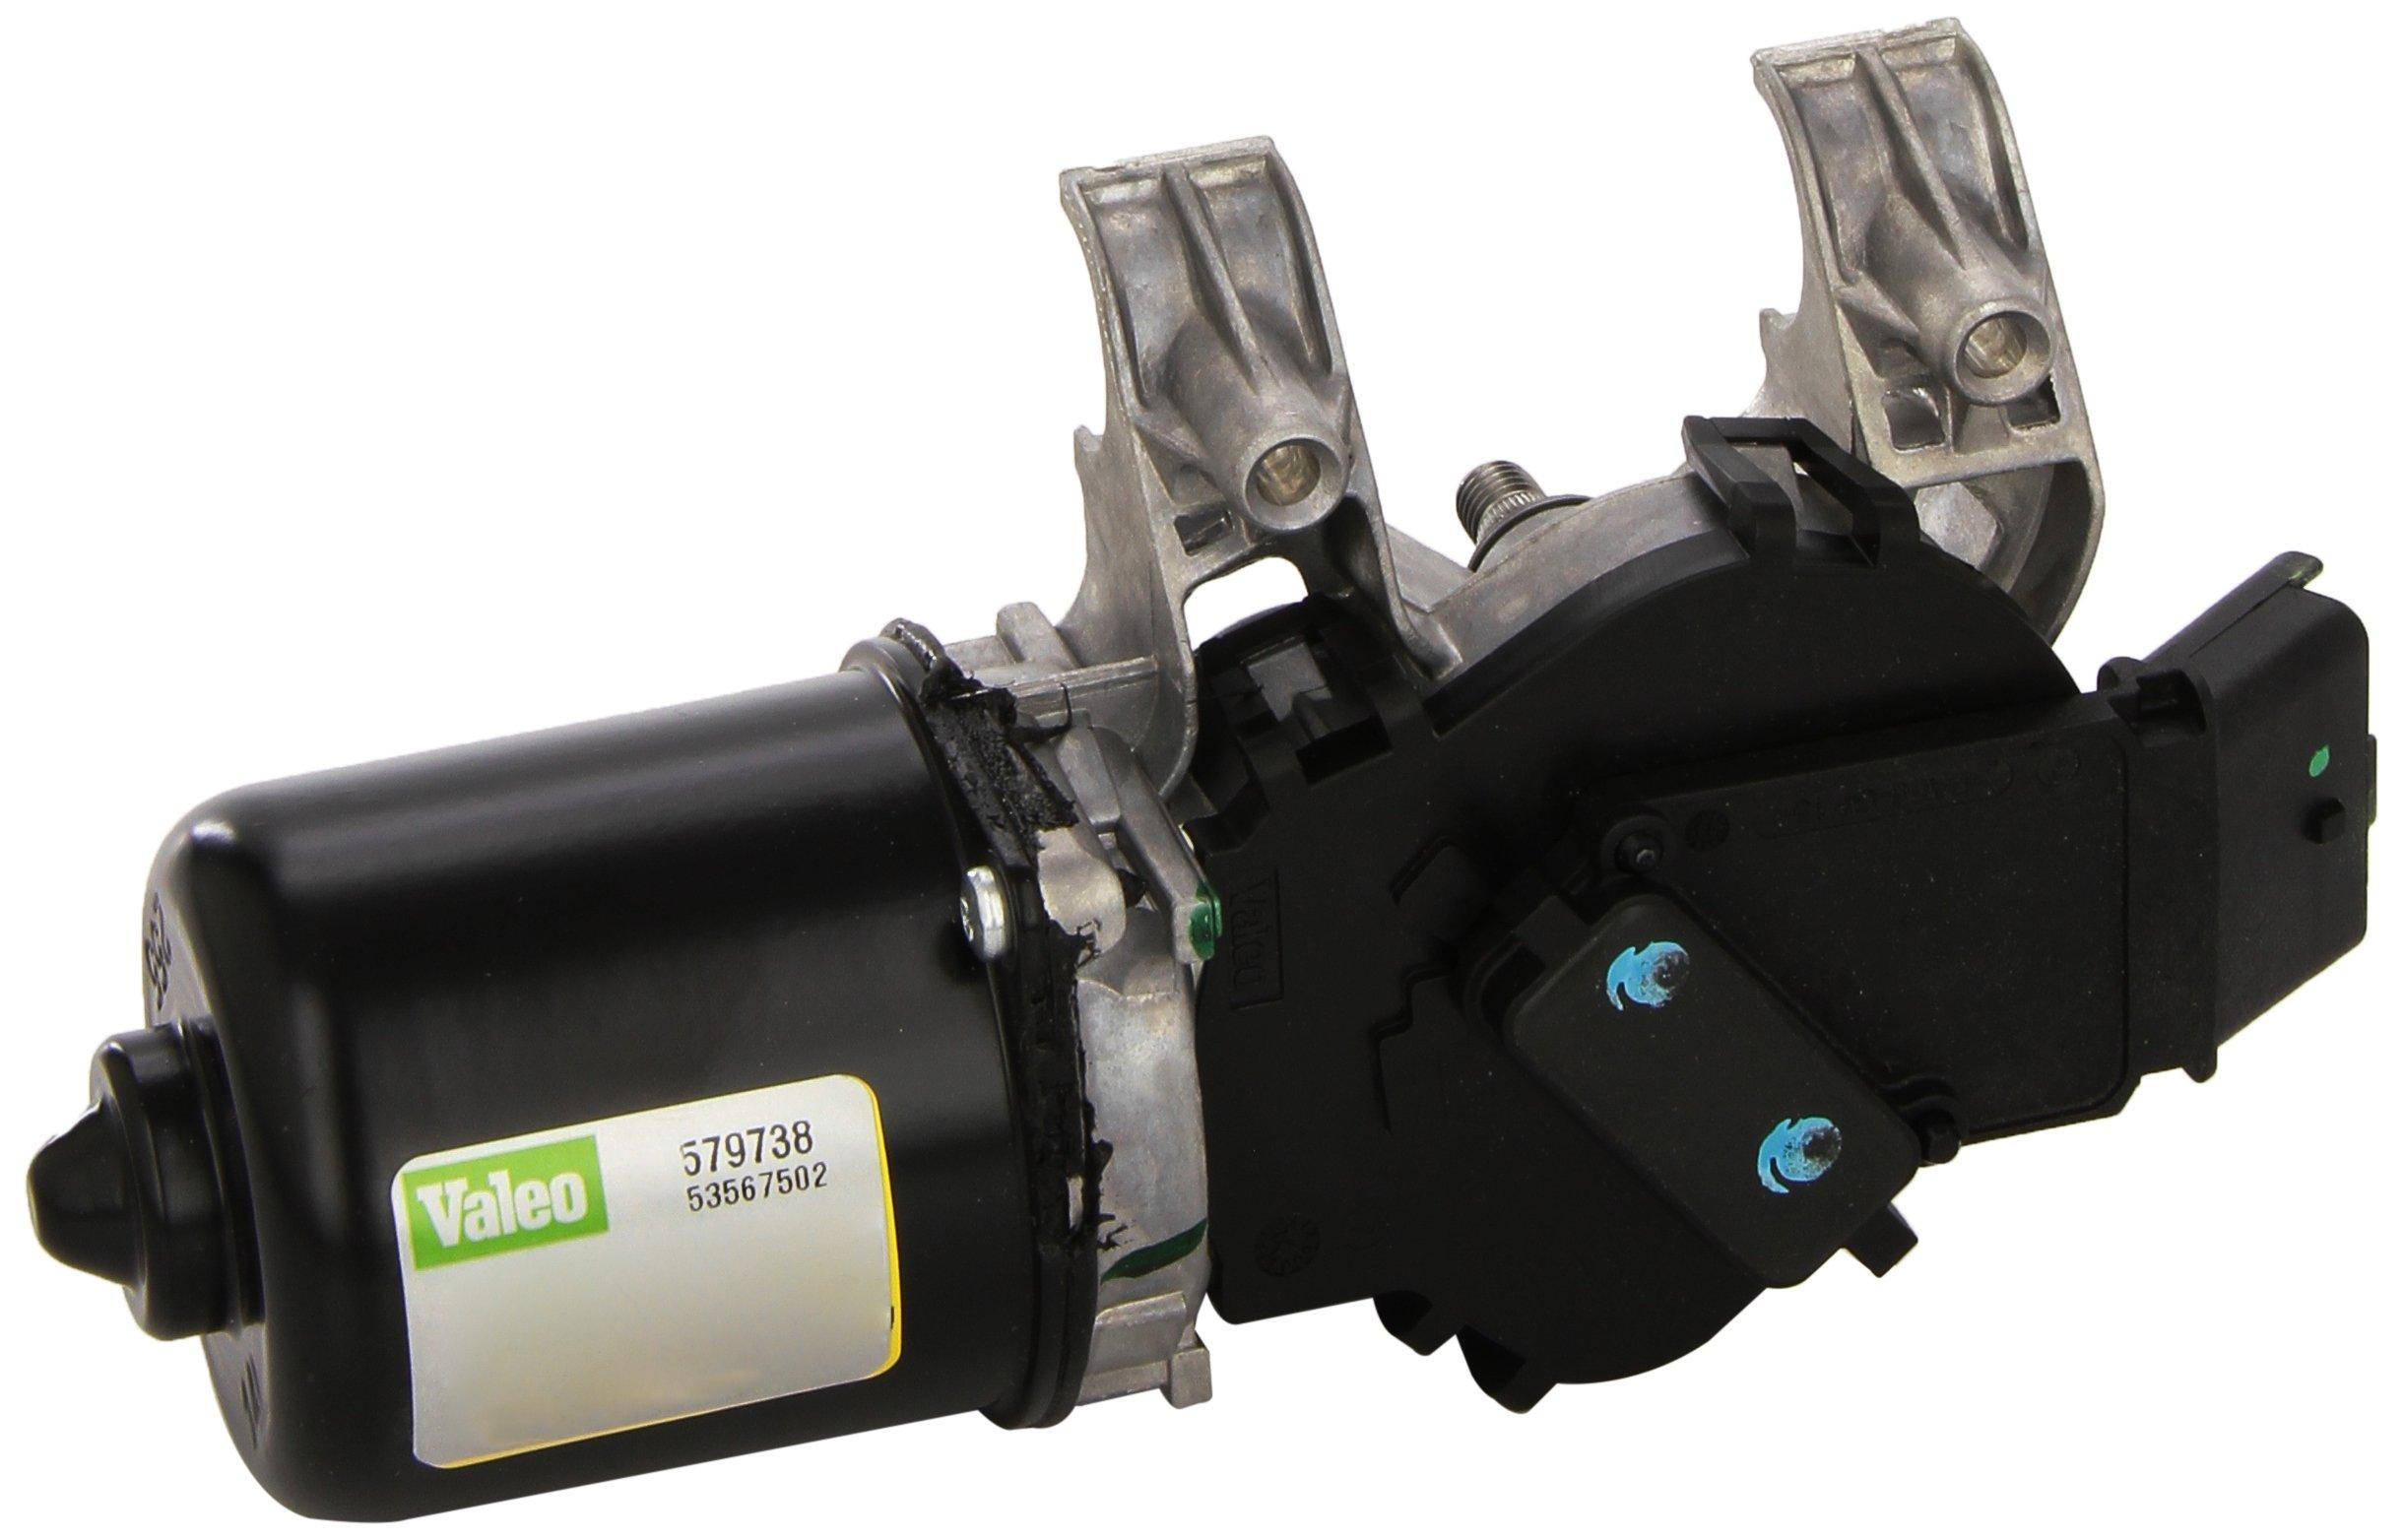 Valeo 579738 Motor del limpiaparabrisas product image